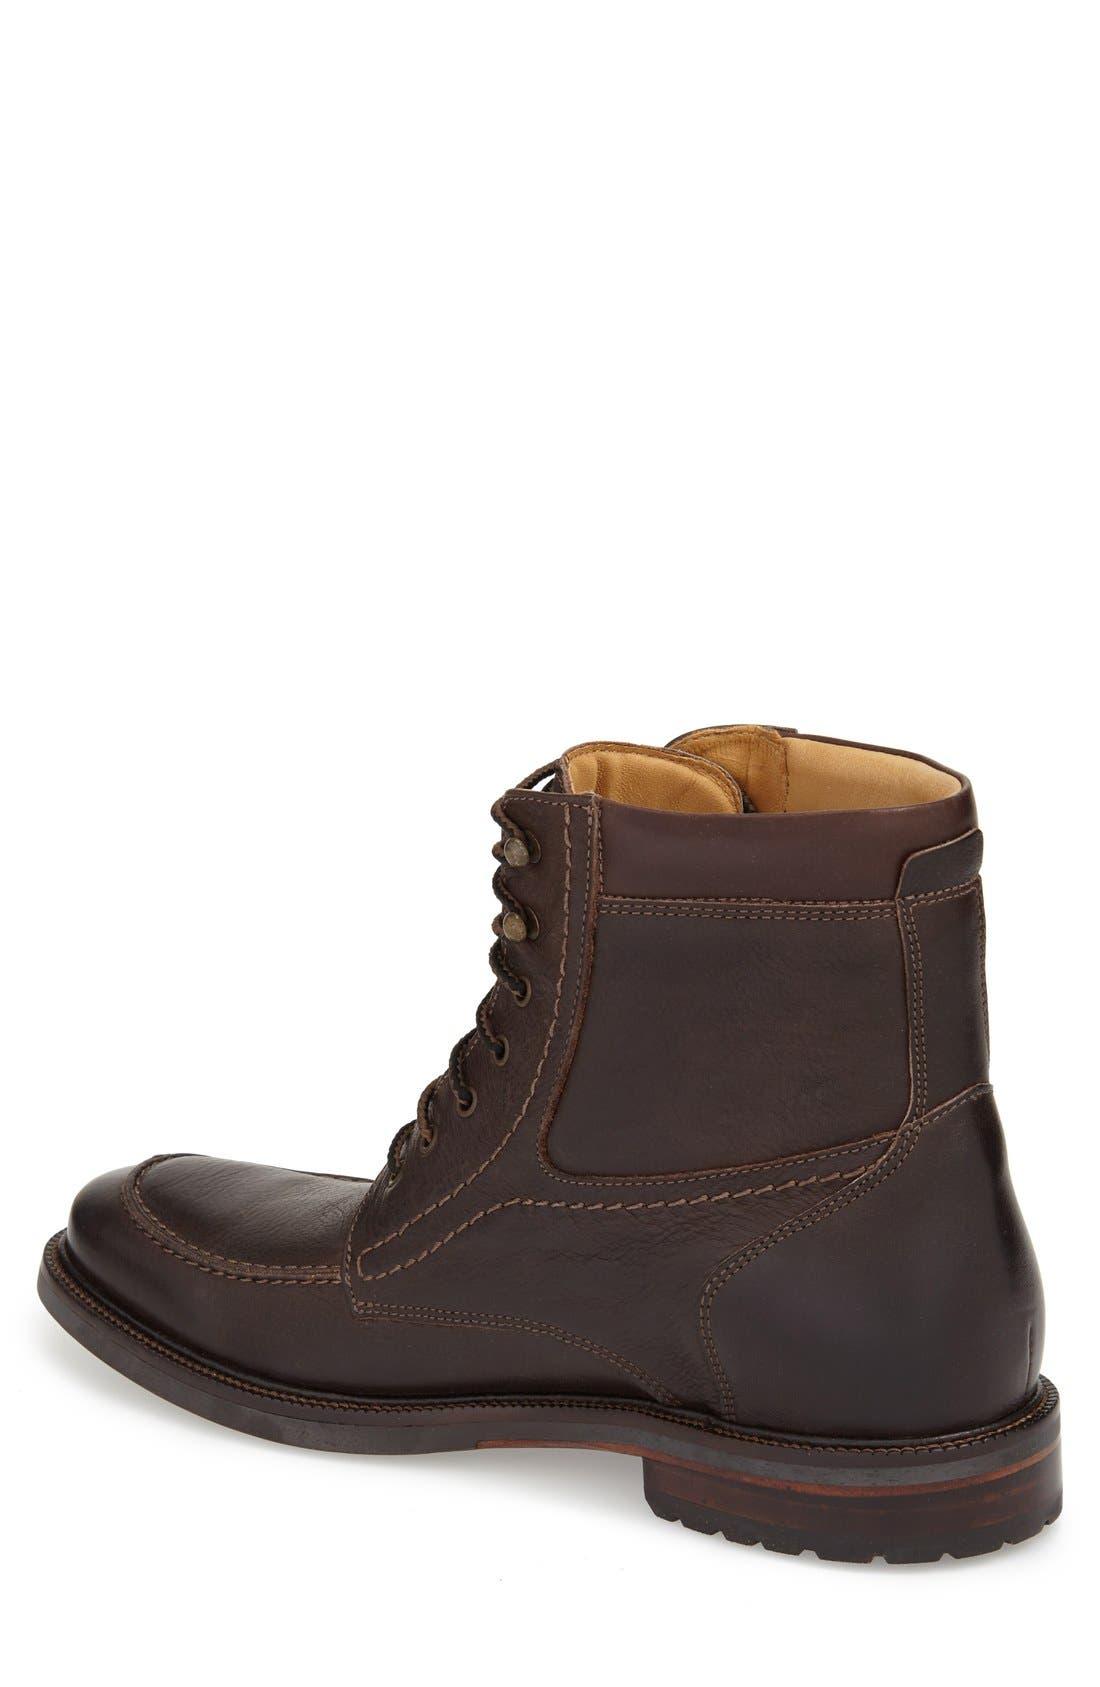 'Baird' Moc Toe Boot,                             Alternate thumbnail 2, color,                             Brown